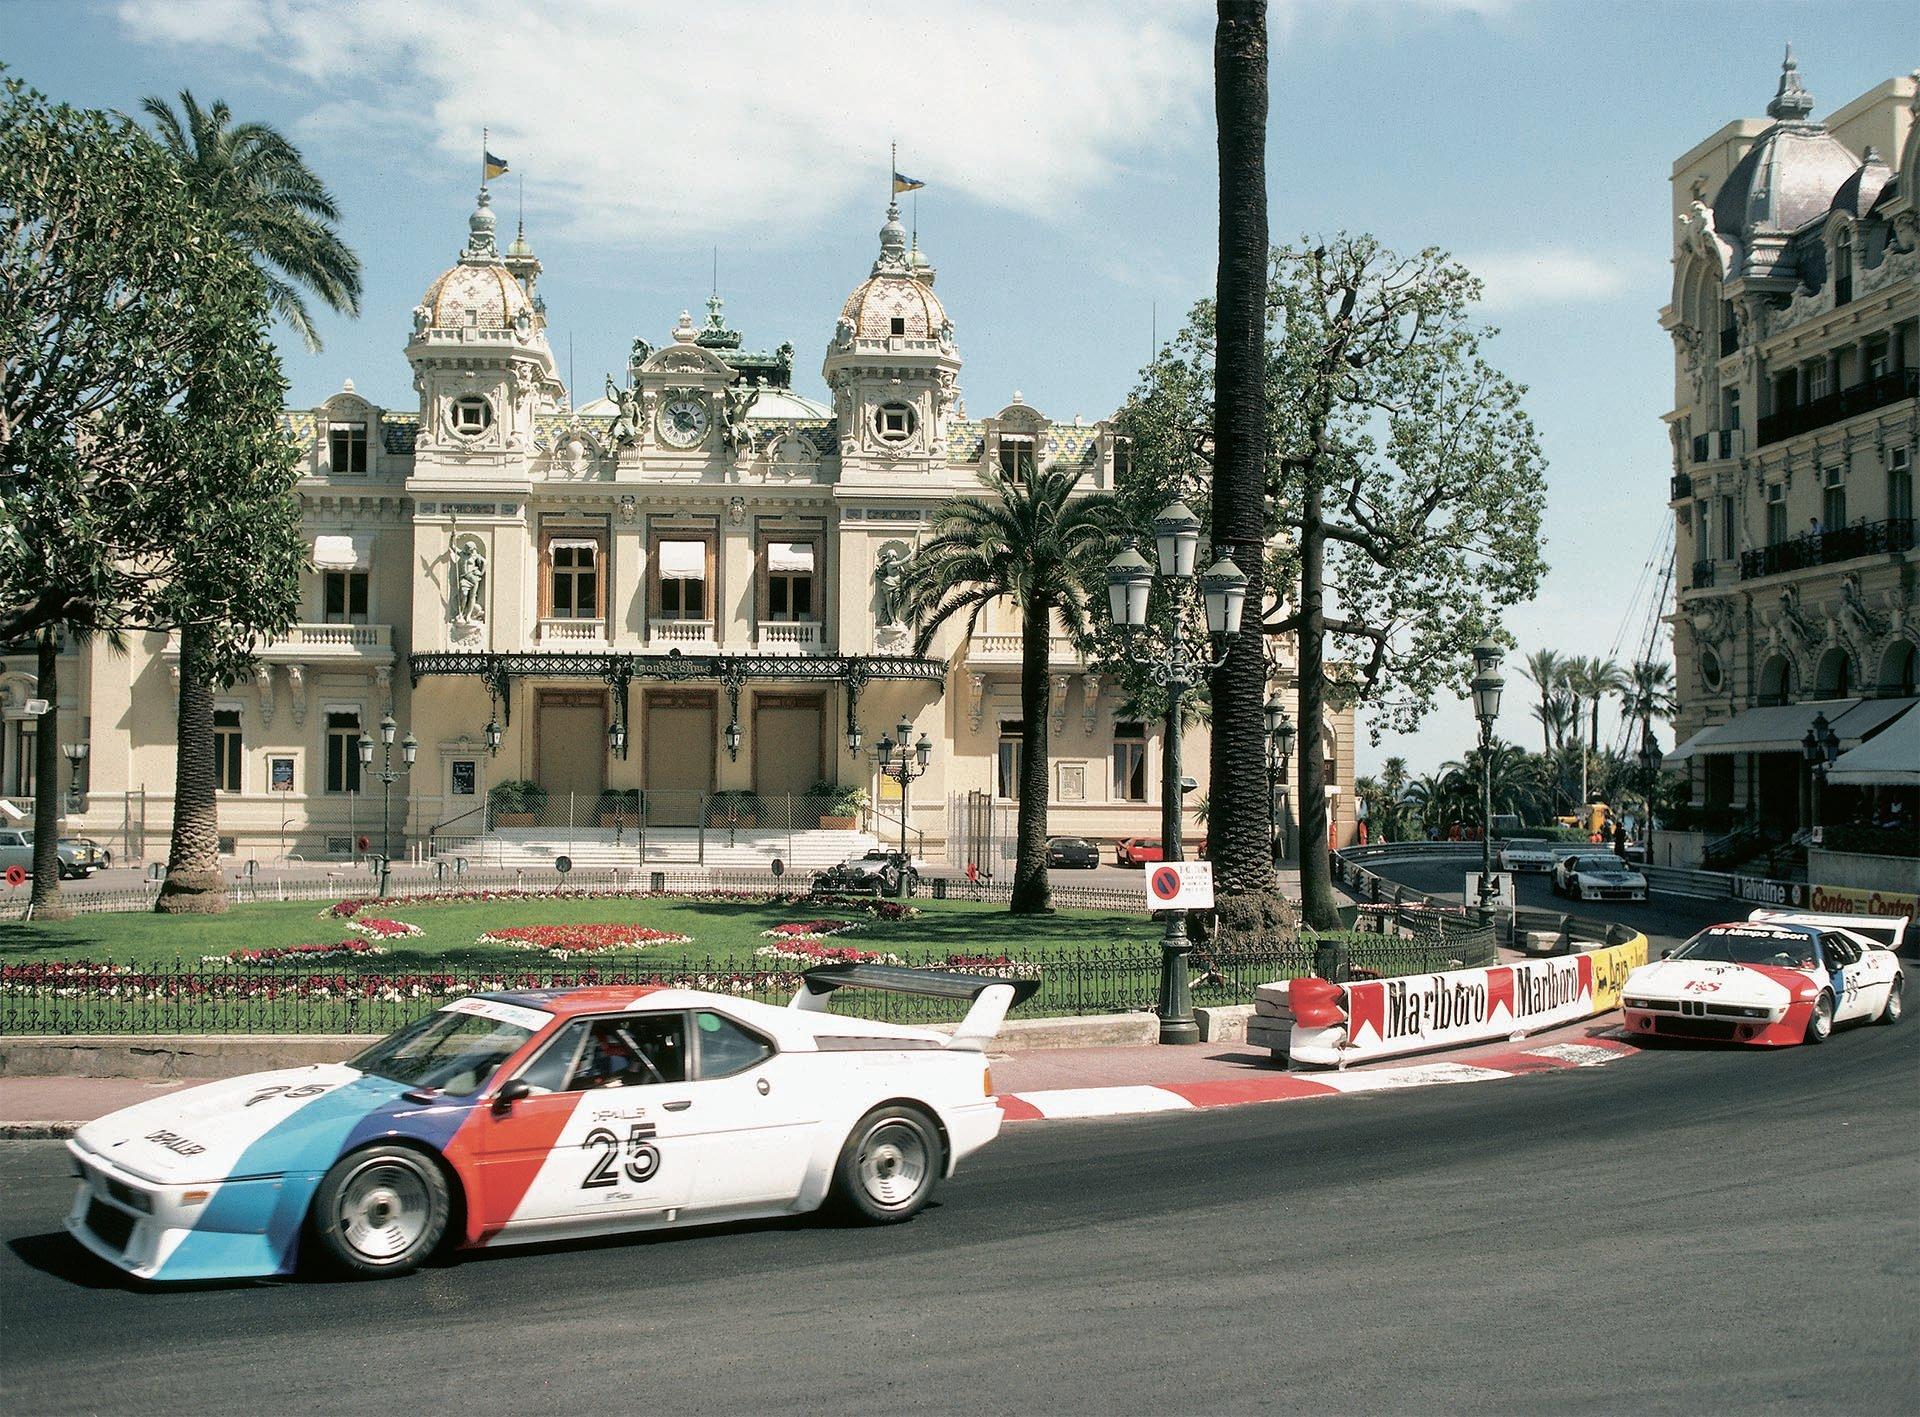 04_BMW M1 Procar at Monaco Grand Prix